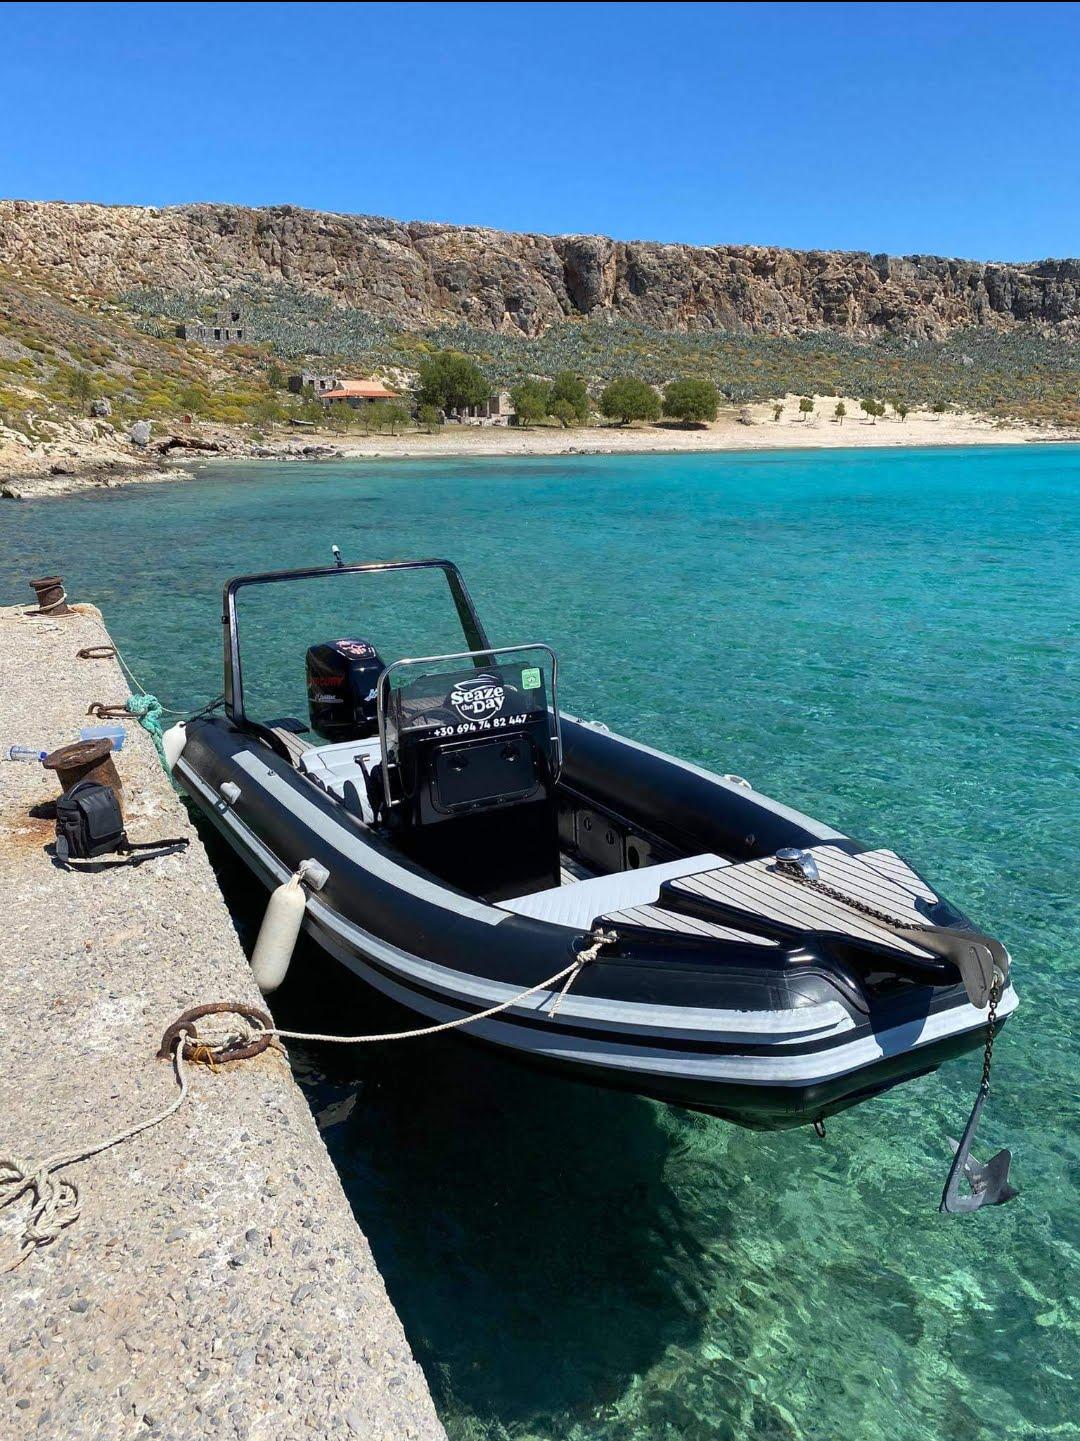 Kissmos bareboat rental